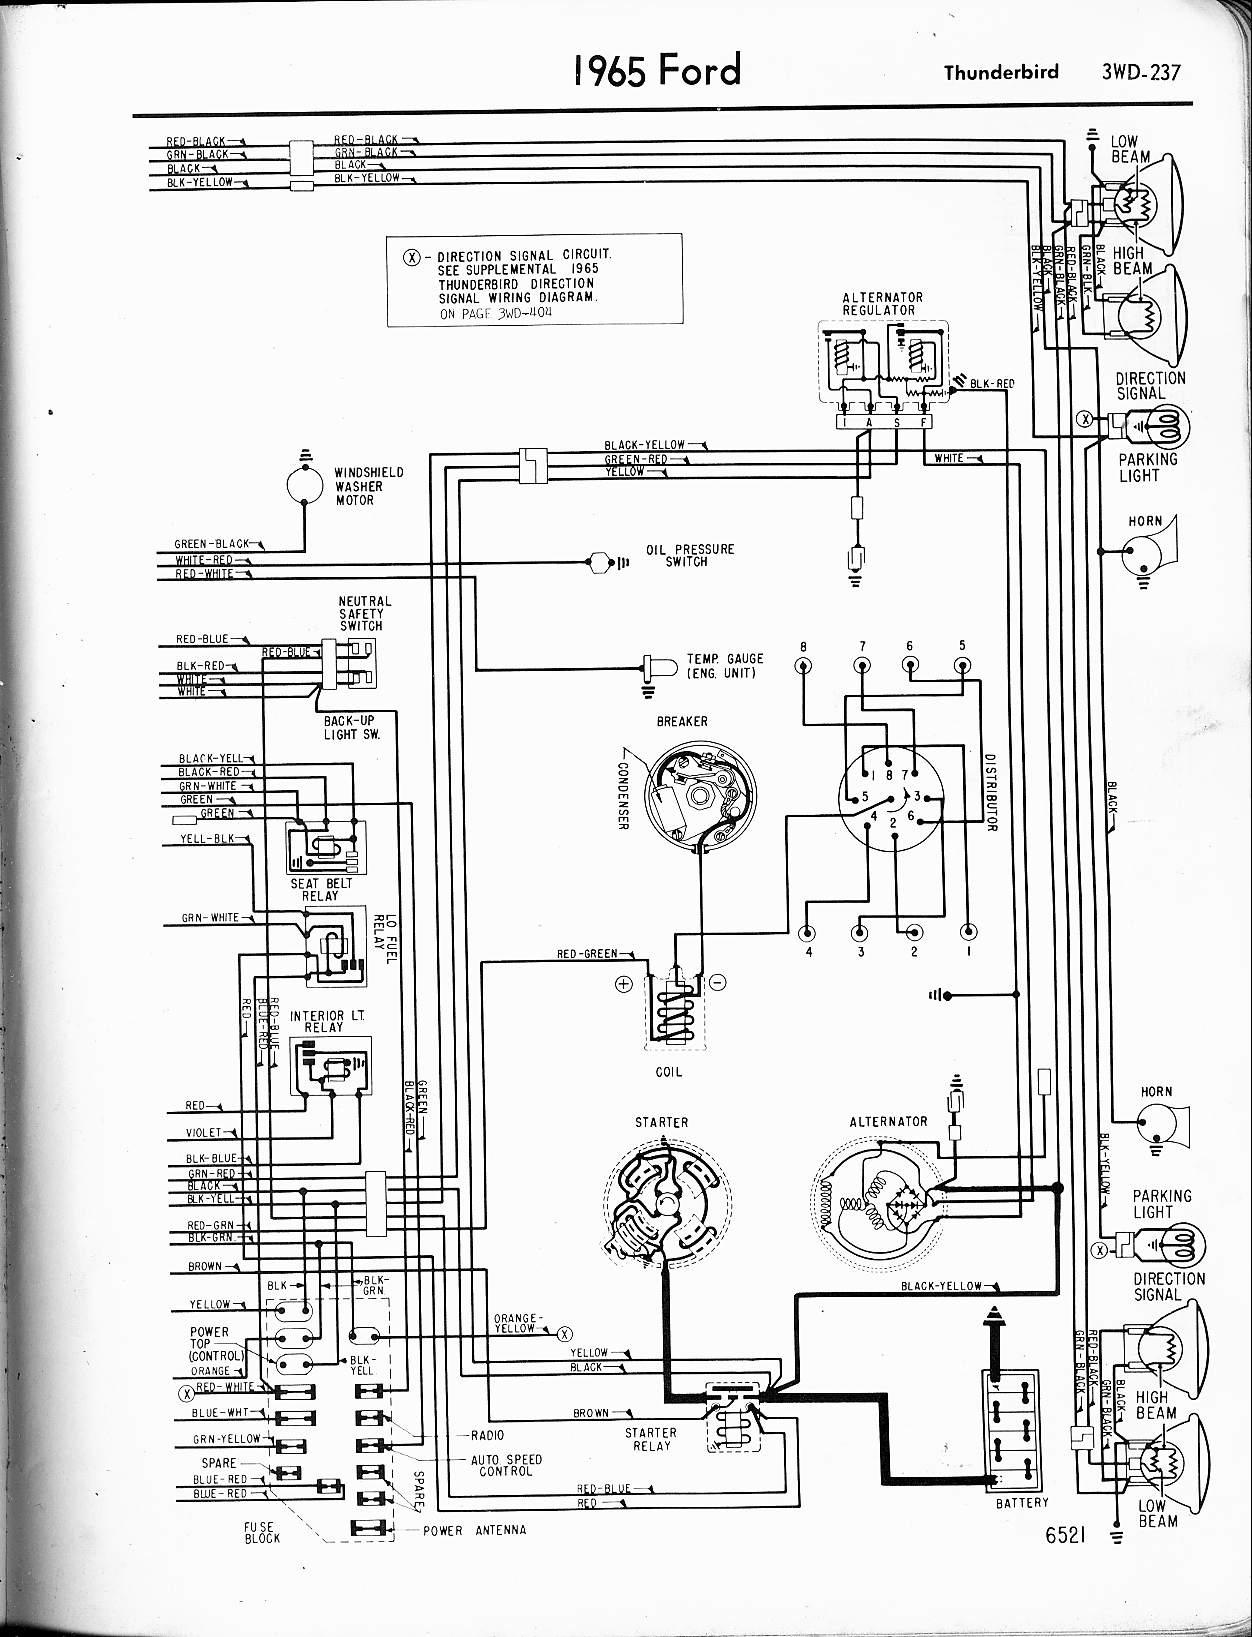 wiring diagram mustang alternator wiring 12 volt solenoid wiring diagram 1965 mustang 12 auto wiring on wiring diagram 1965 mustang alternator